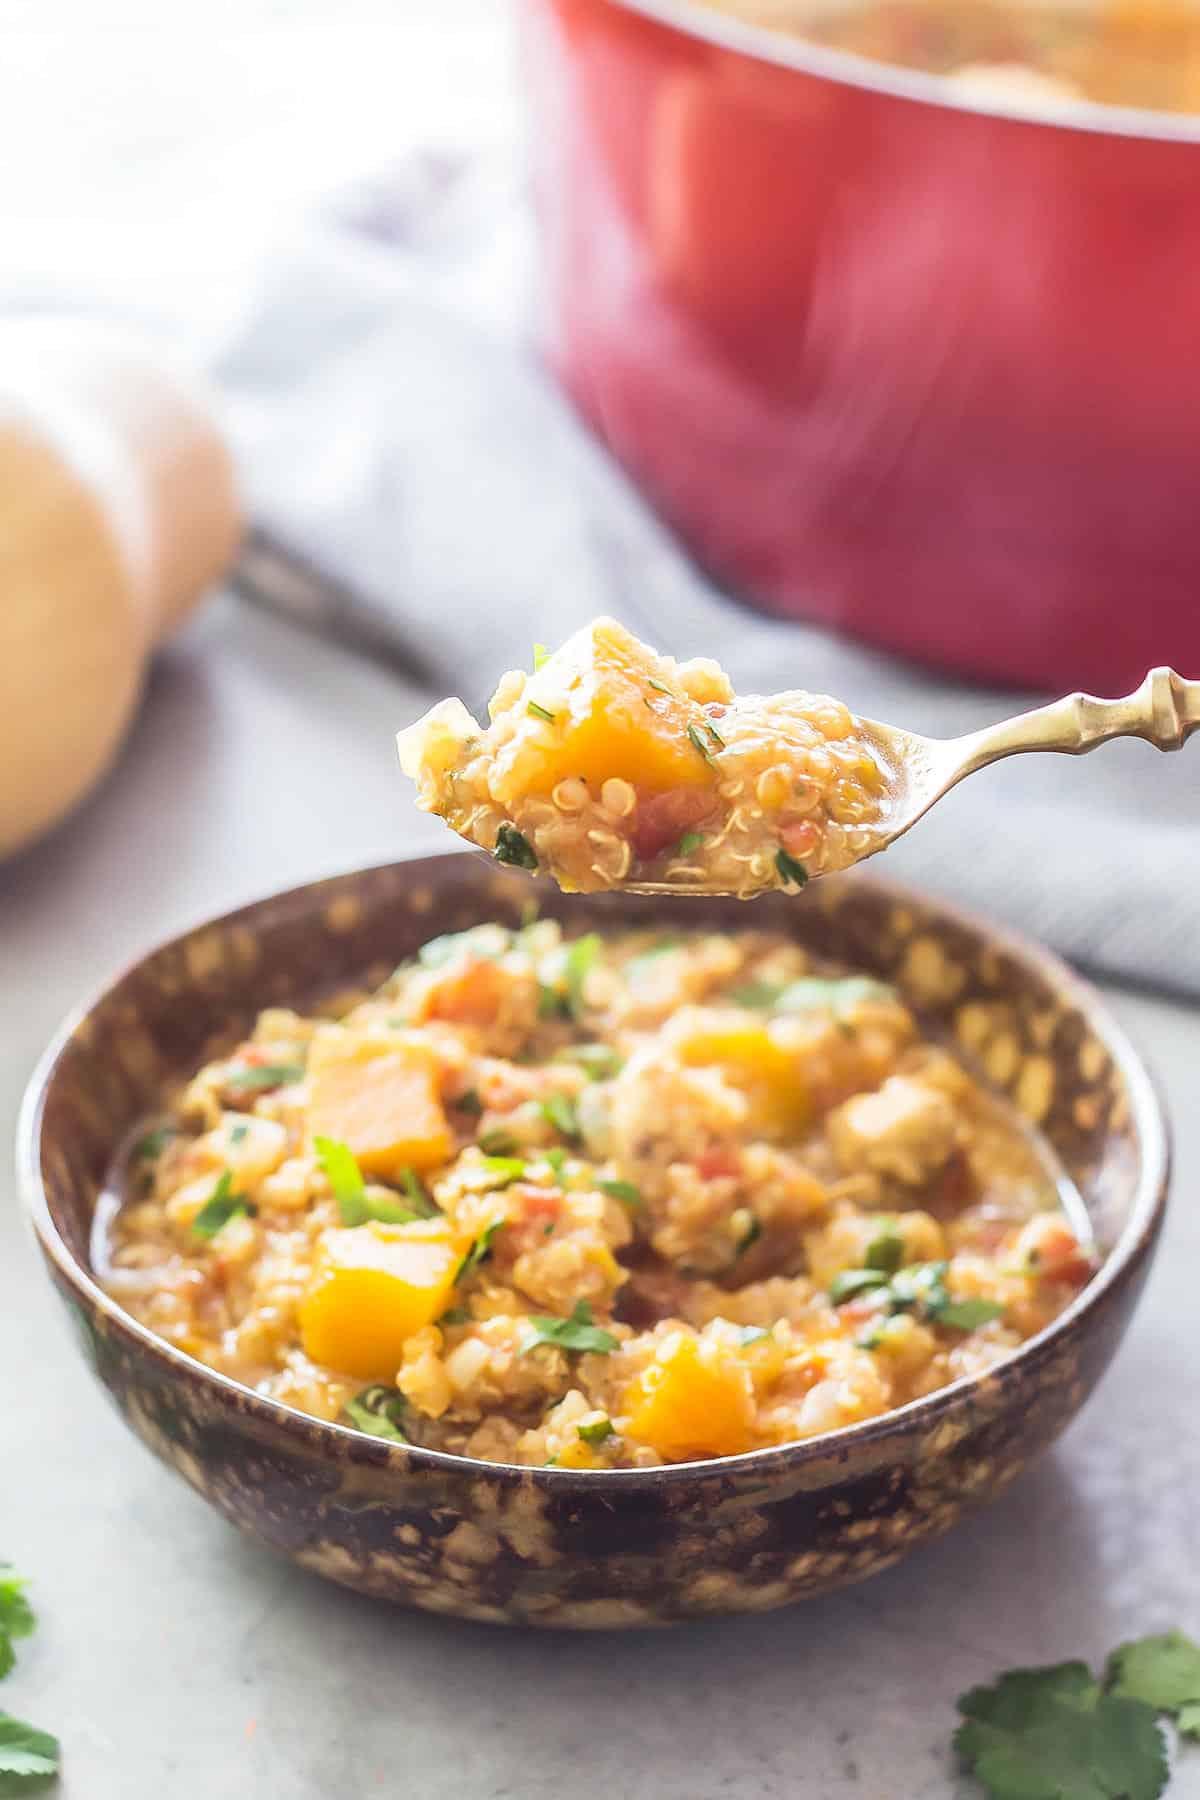 Instant Pot Stew with Chicken